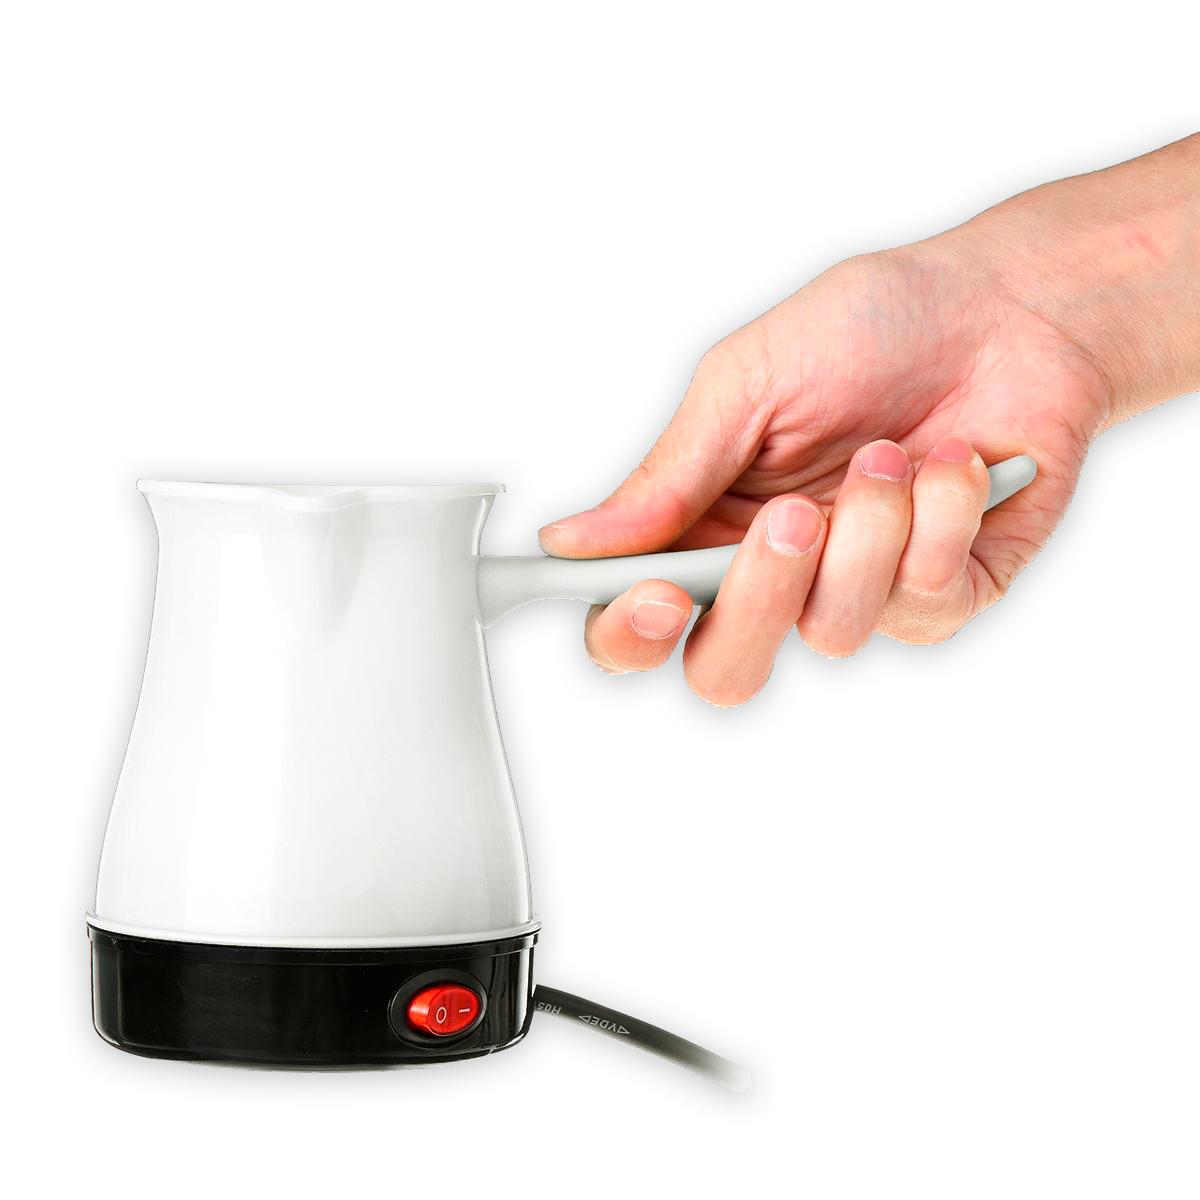 Турка- кофеварка электро Marado MA-1626, 600 Вт, 2 цвета